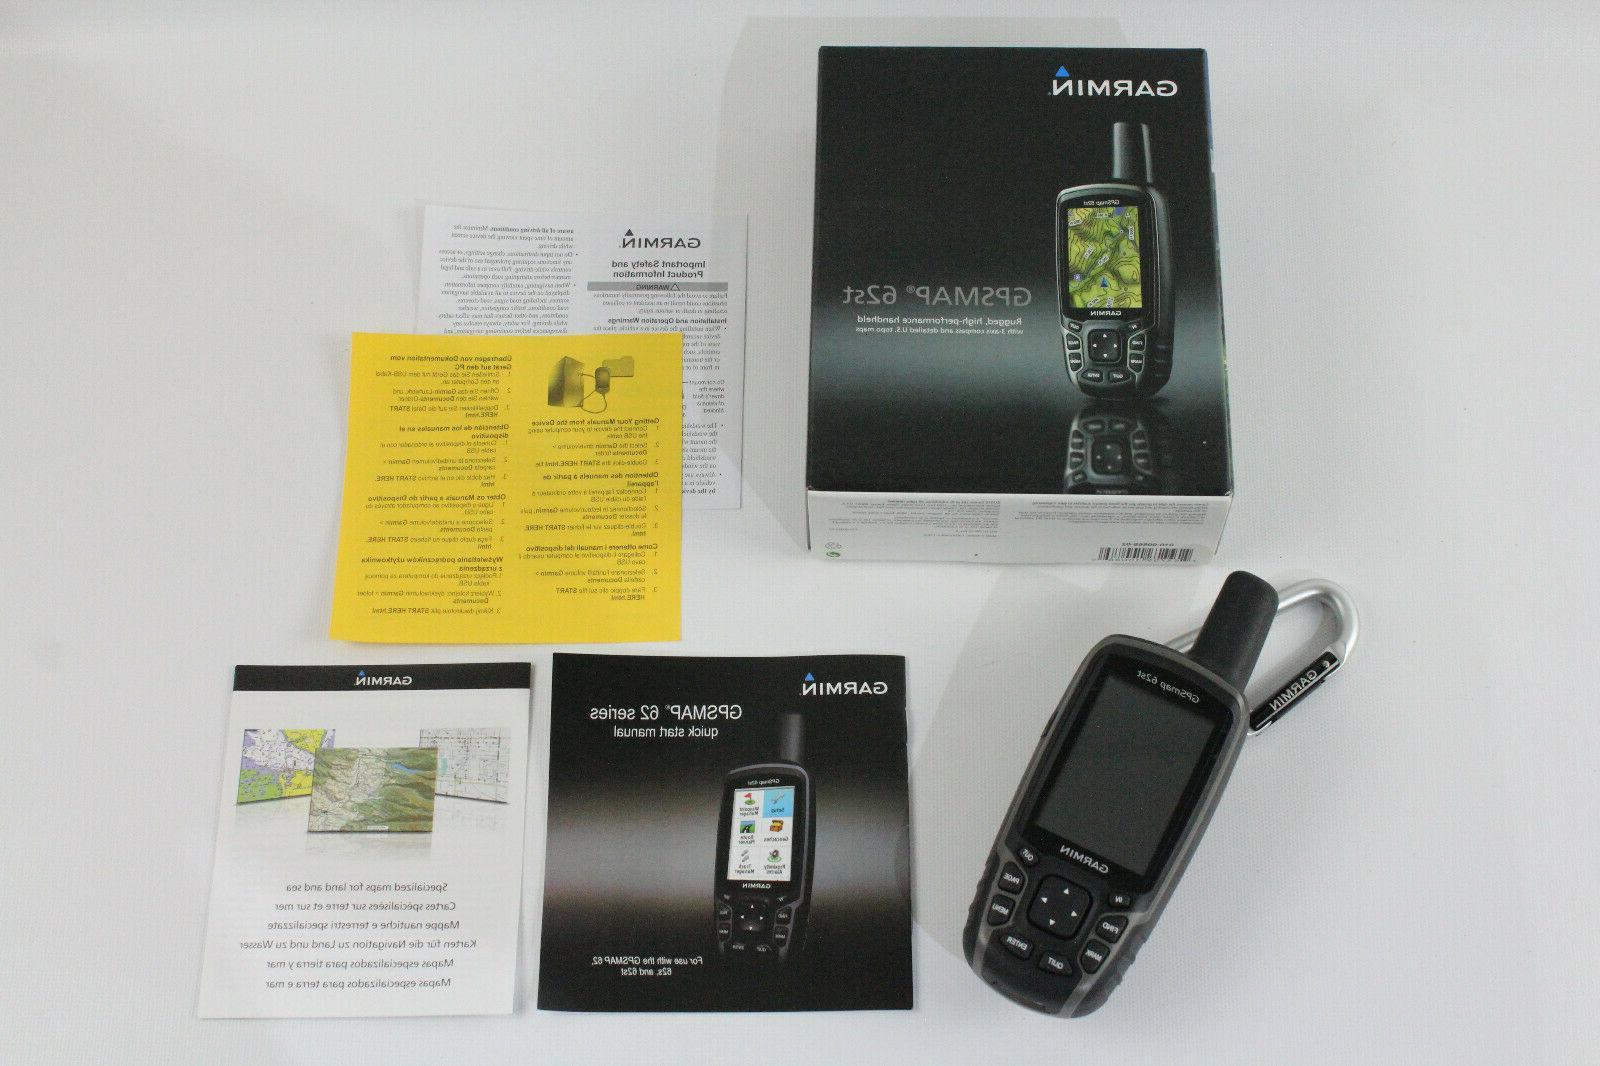 gpsmap 62st handheld gps unit tested